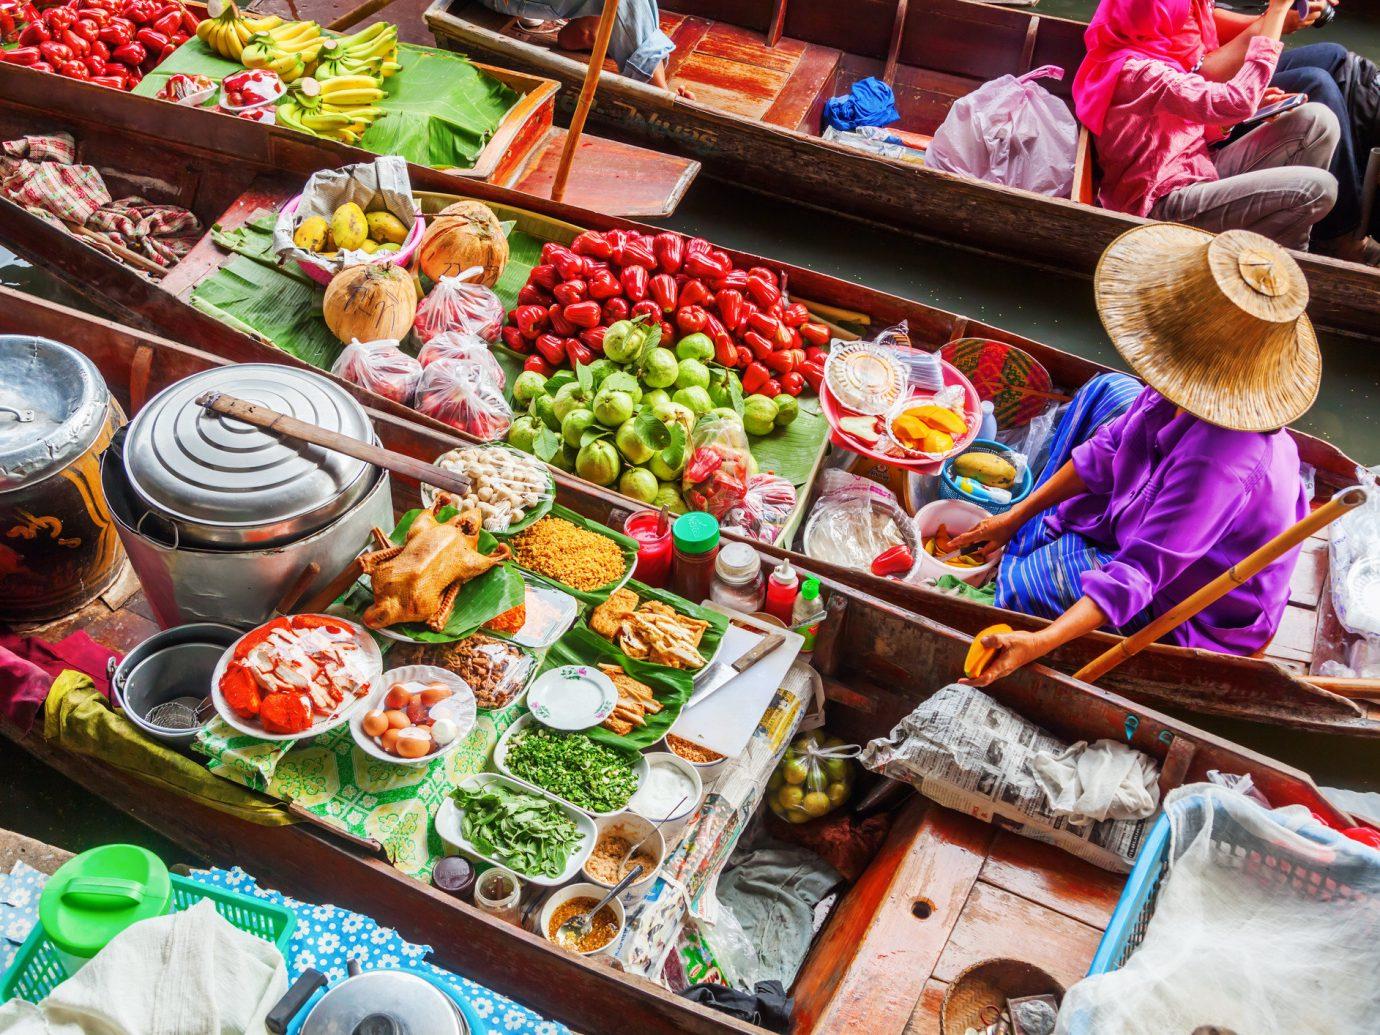 Trip Ideas color marketplace public space City market vendor food human settlement dish scene bazaar grocery store greengrocer street food cuisine sweetness asian food different several Shop